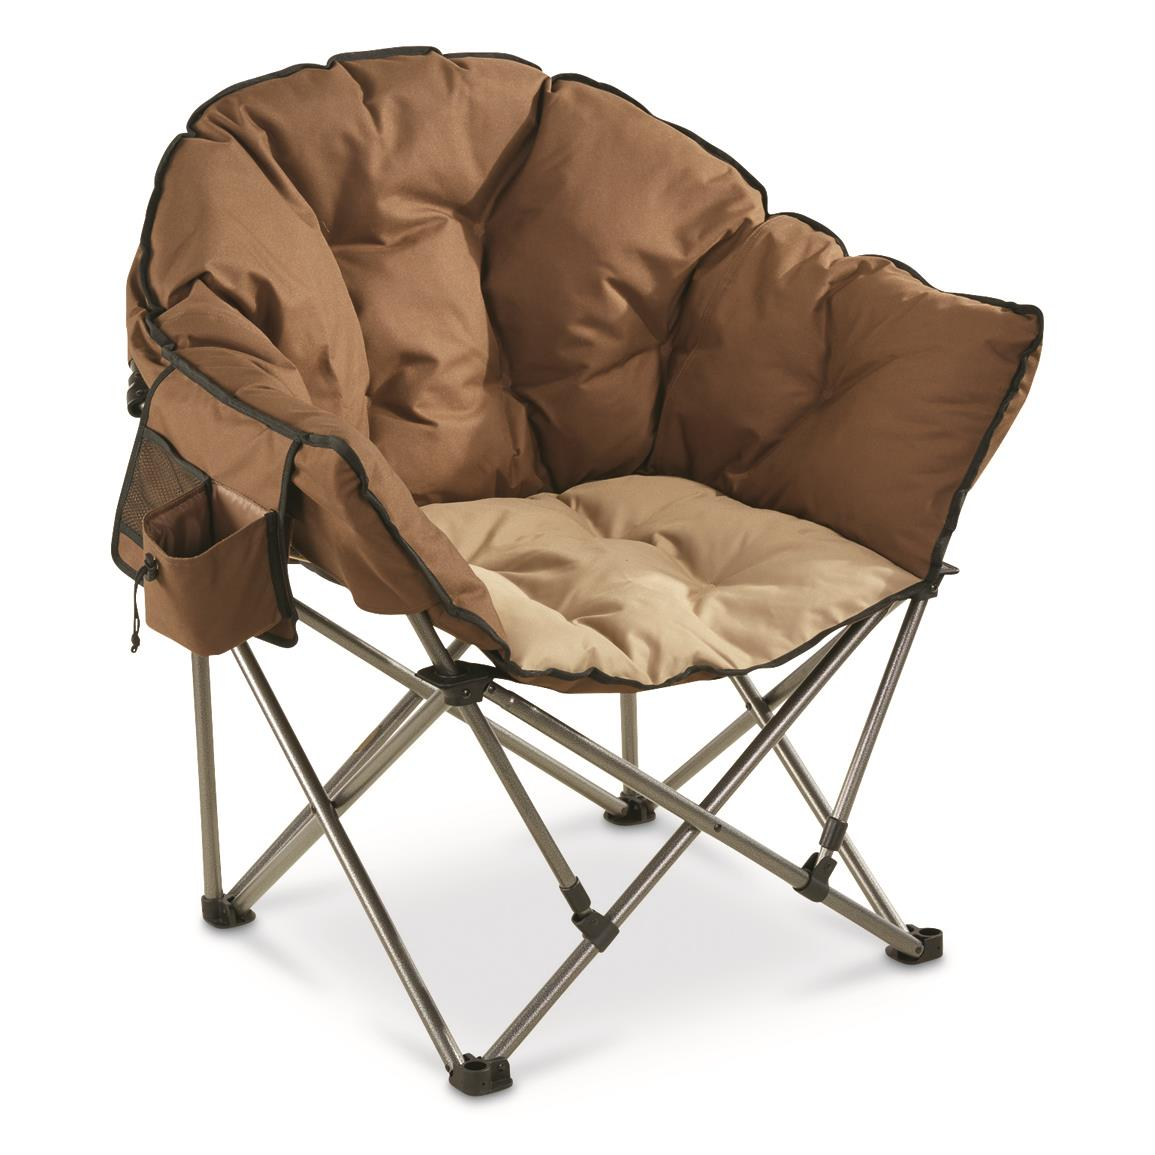 camp chairs shown in tan/brown, tan/brown ZMSXJPE